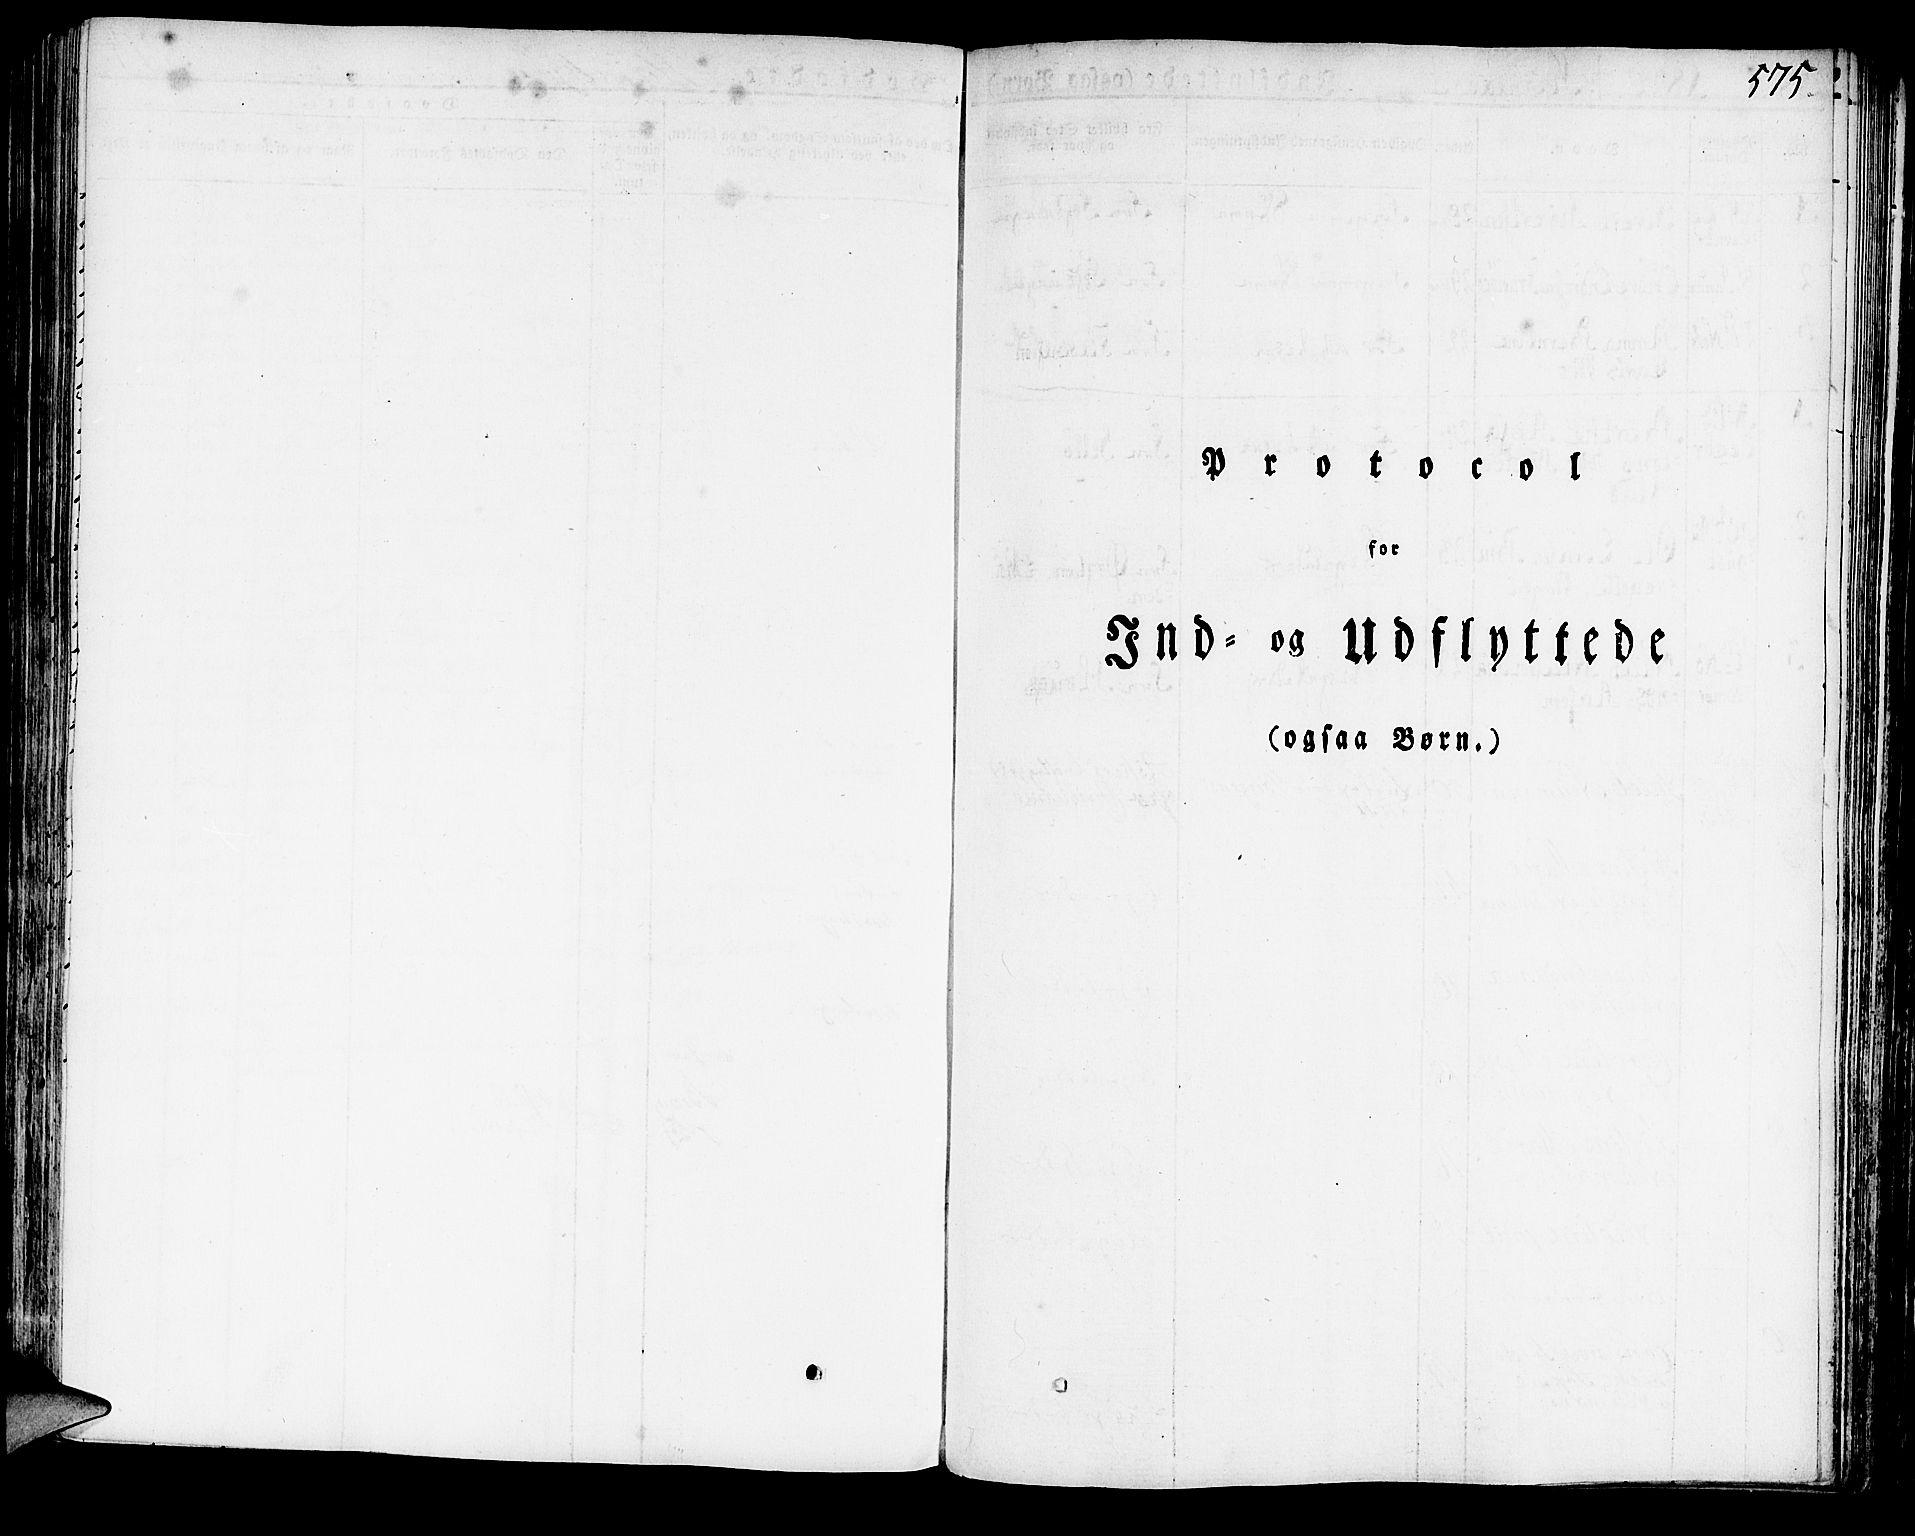 SAB, Domkirken Sokneprestembete, H/Haa/L0012: Ministerialbok nr. A 12, 1821-1840, s. 575